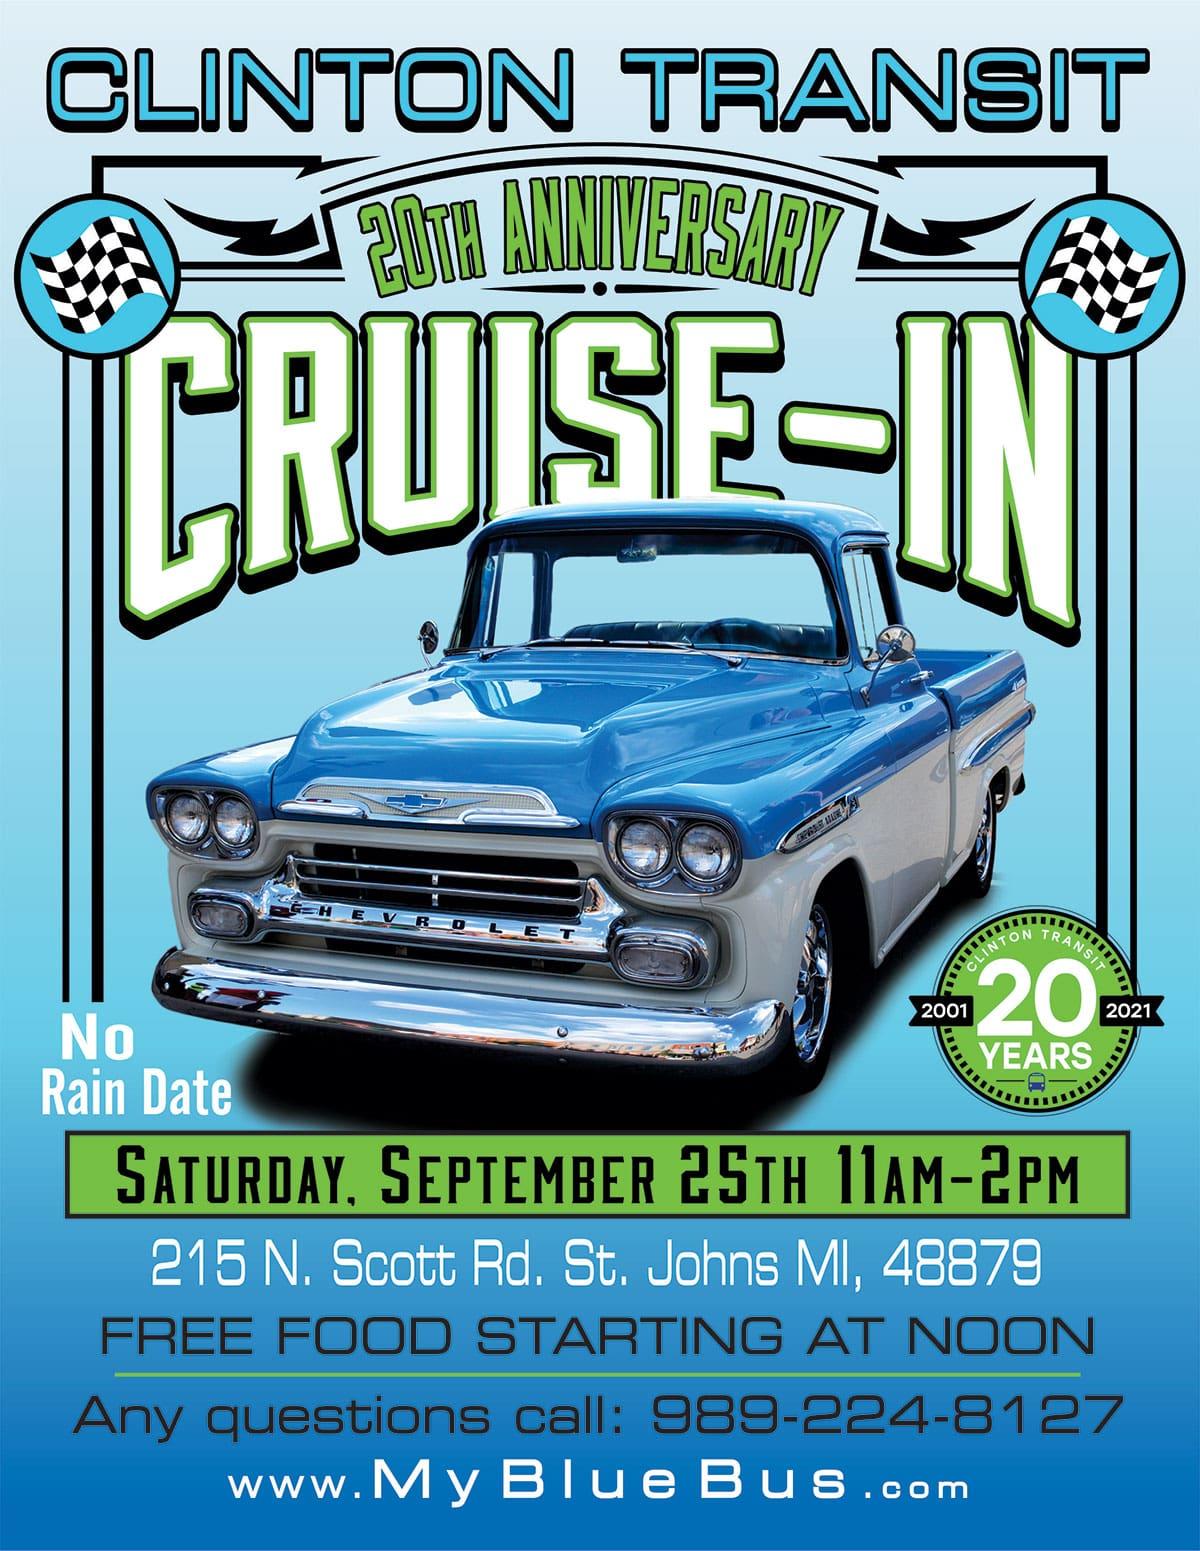 clinton transit cruise-in